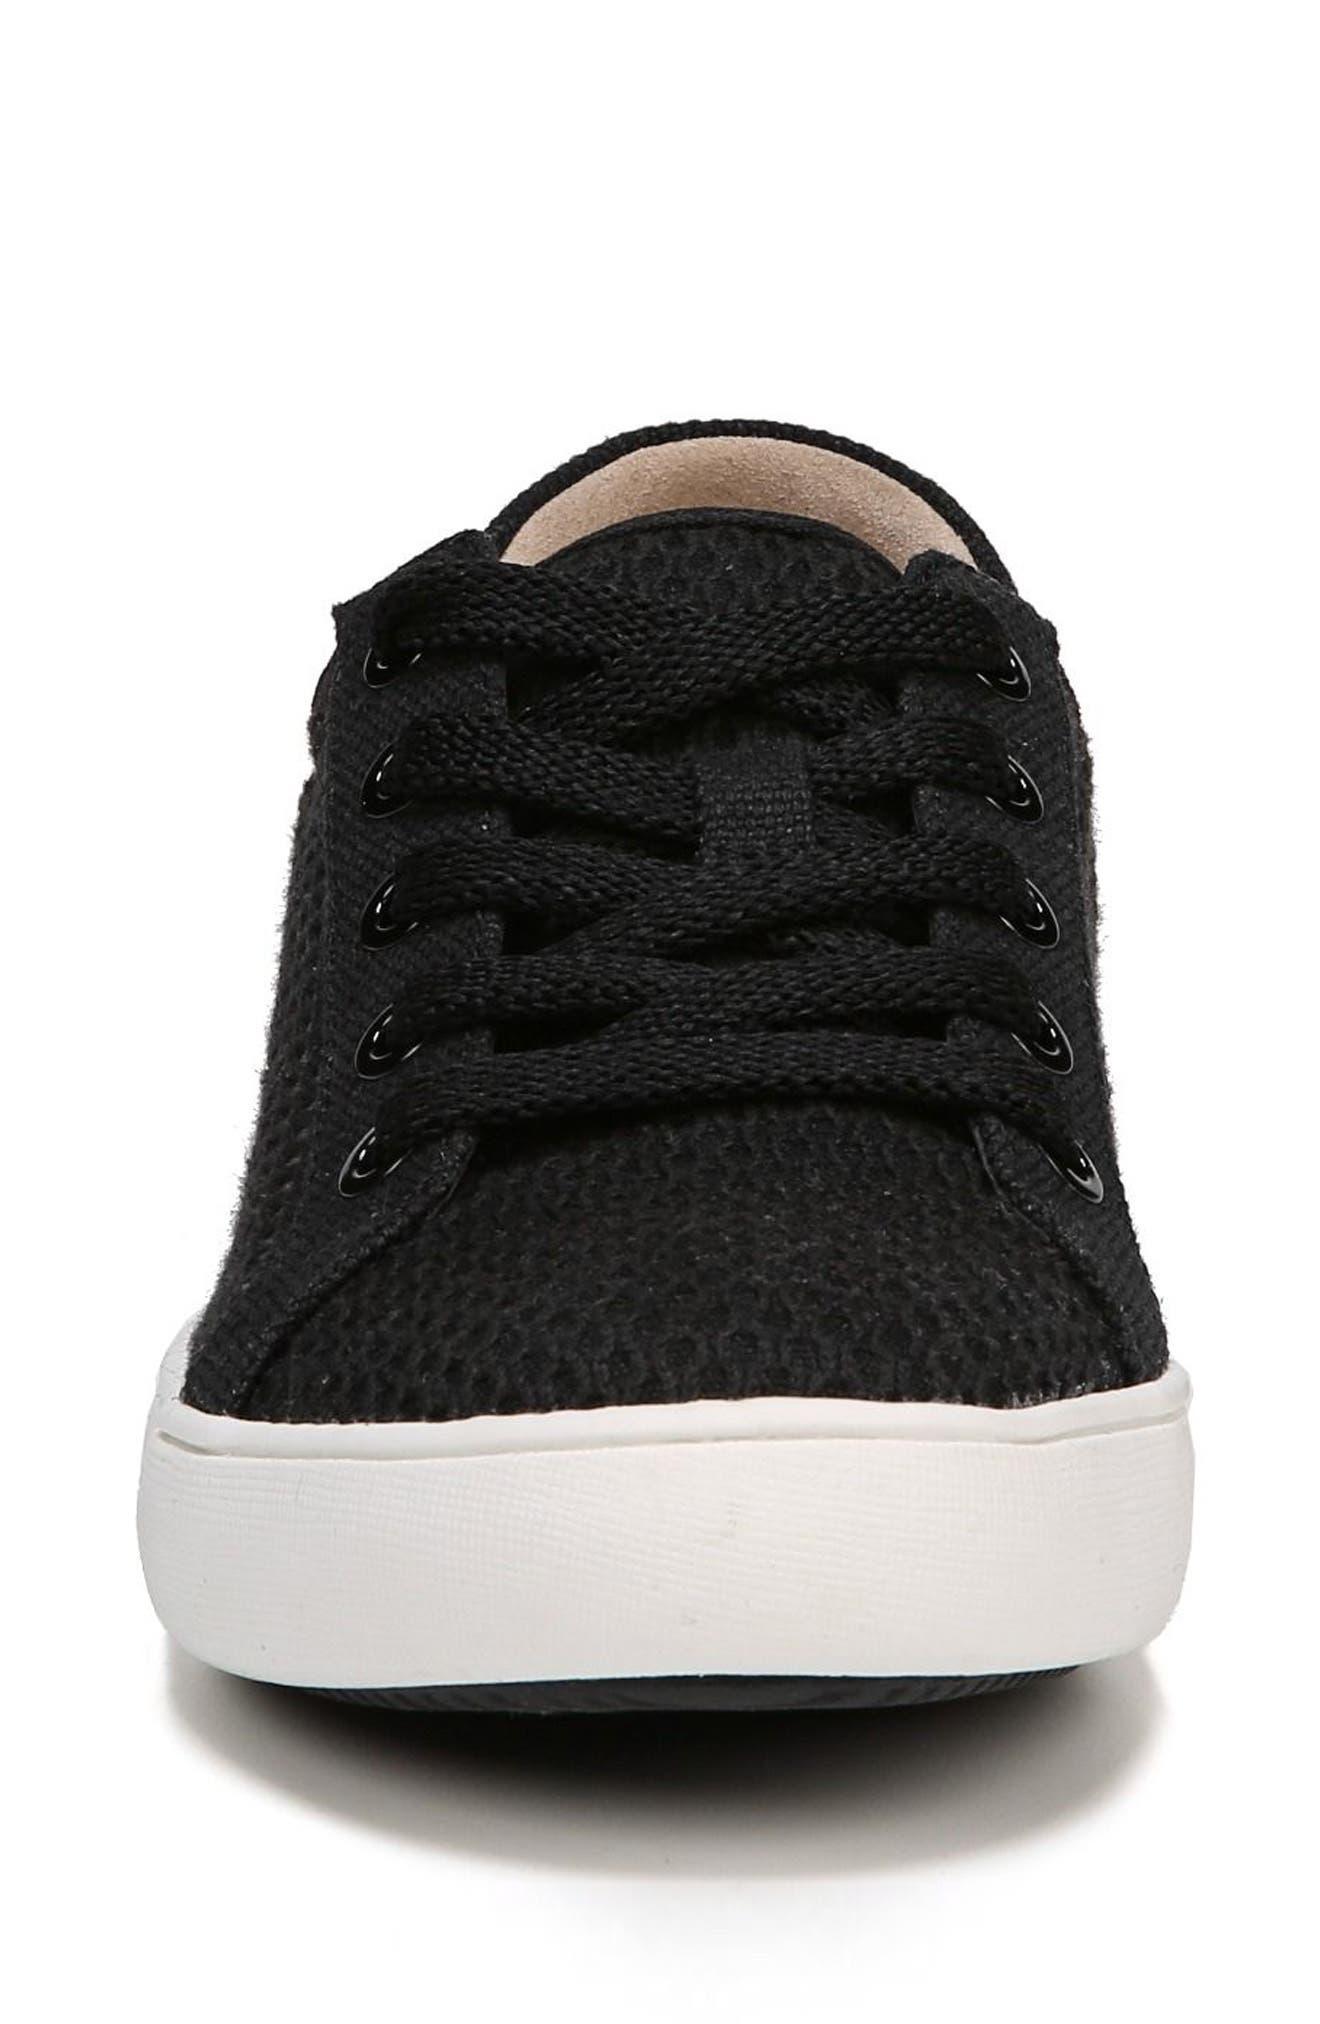 Morrison III Perforated Sneaker,                             Alternate thumbnail 4, color,                             BLACK FABRIC